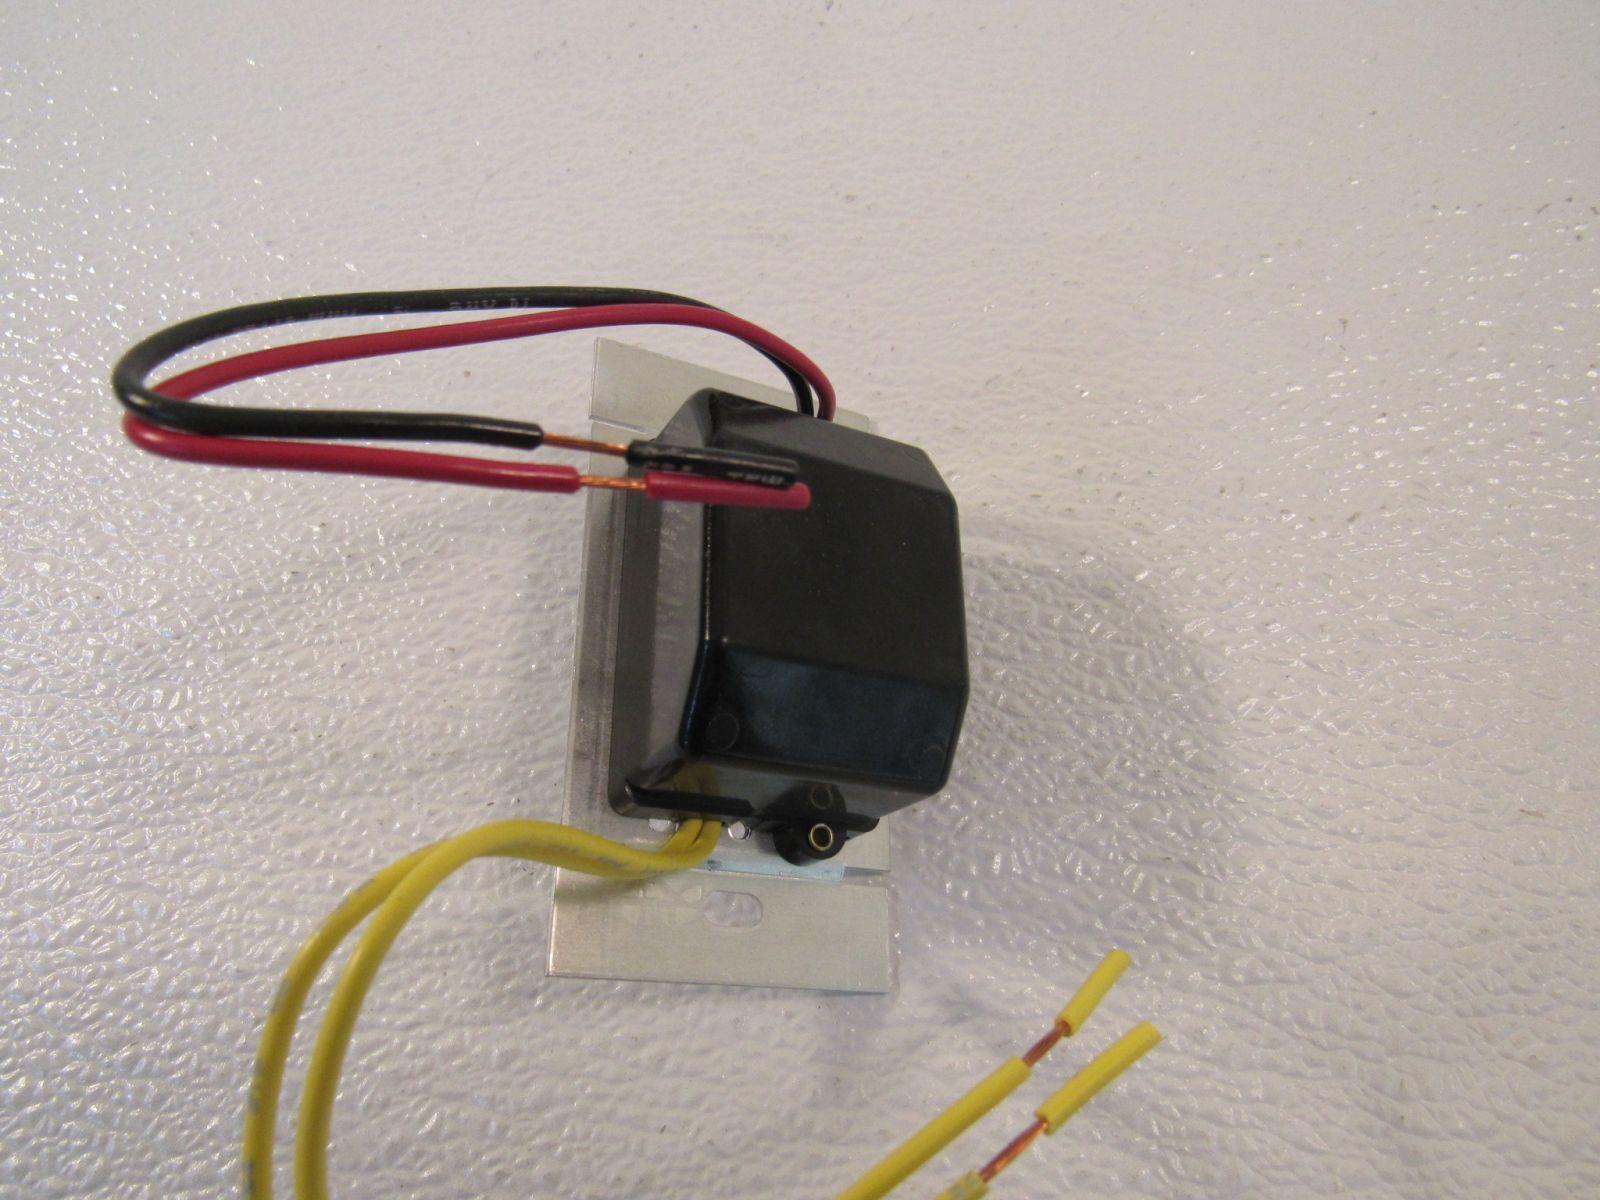 Lutron Fluorescent Lighting Control FD-40 FD-40-277 FD-80 FD-80-277 FC-1U